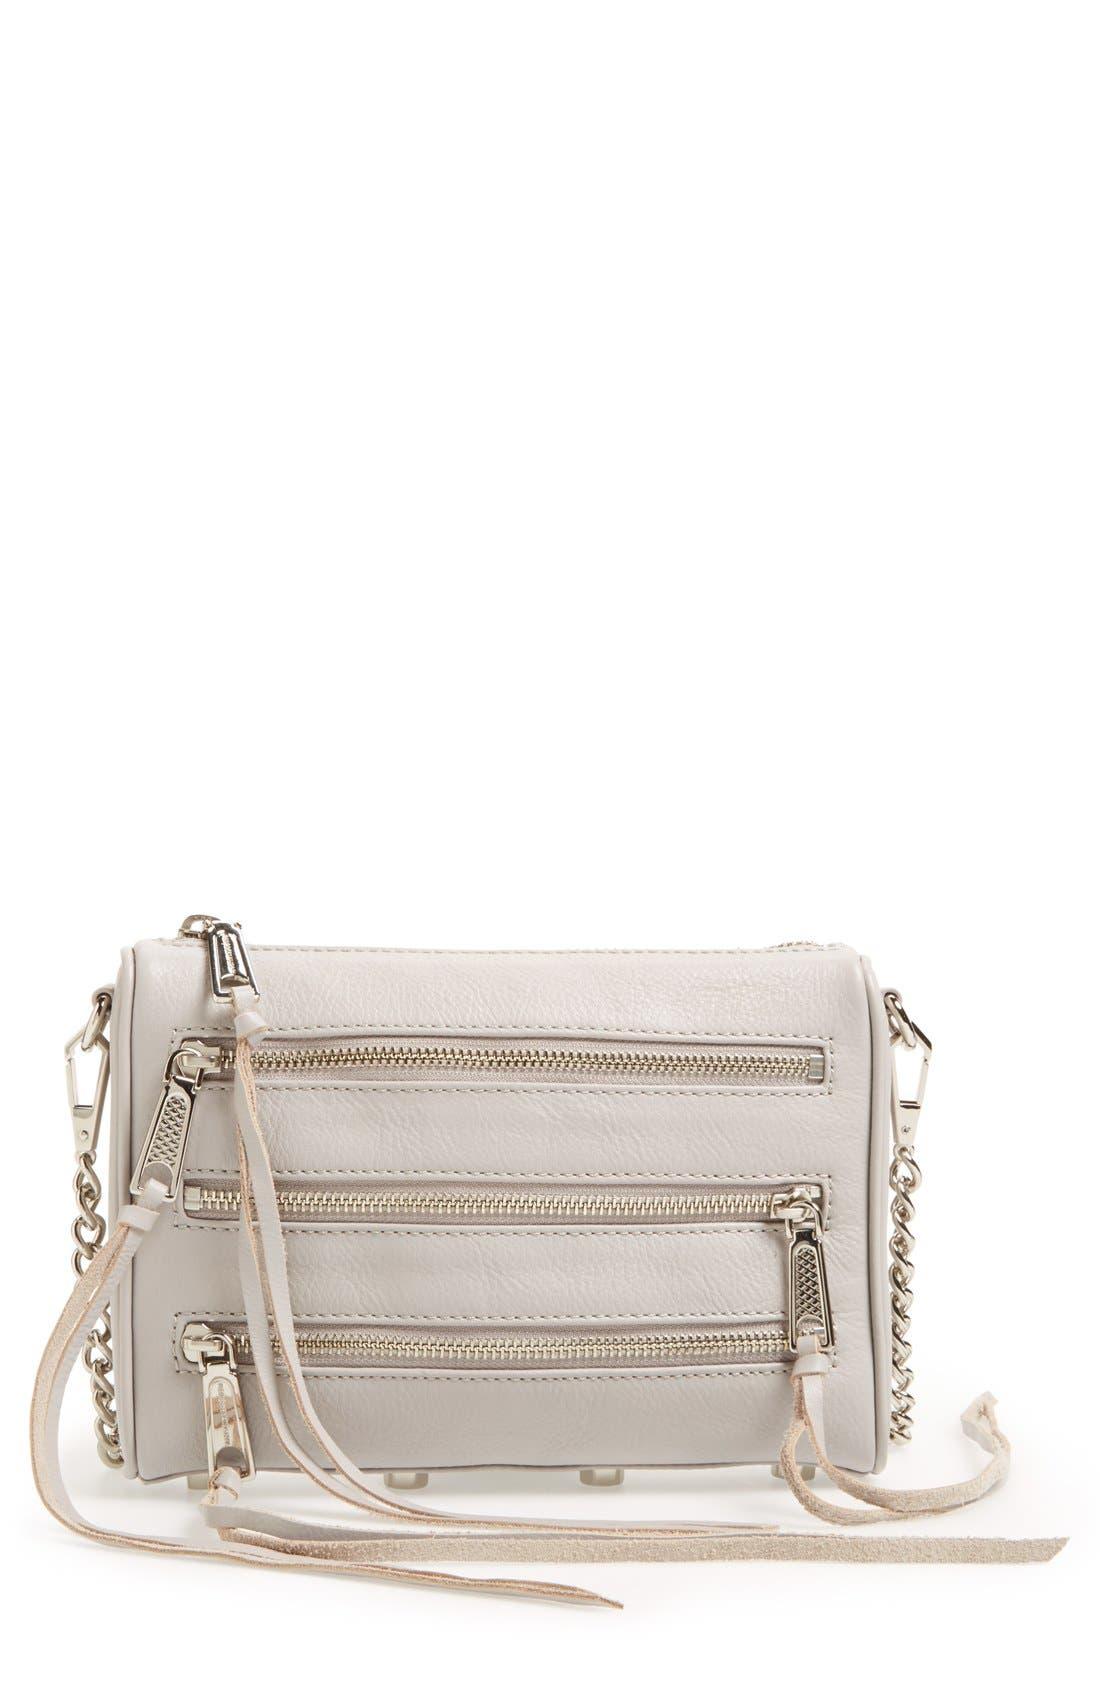 Main Image - Rebecca Minkoff Mini 5 Zip Convertible Crossbody Bag